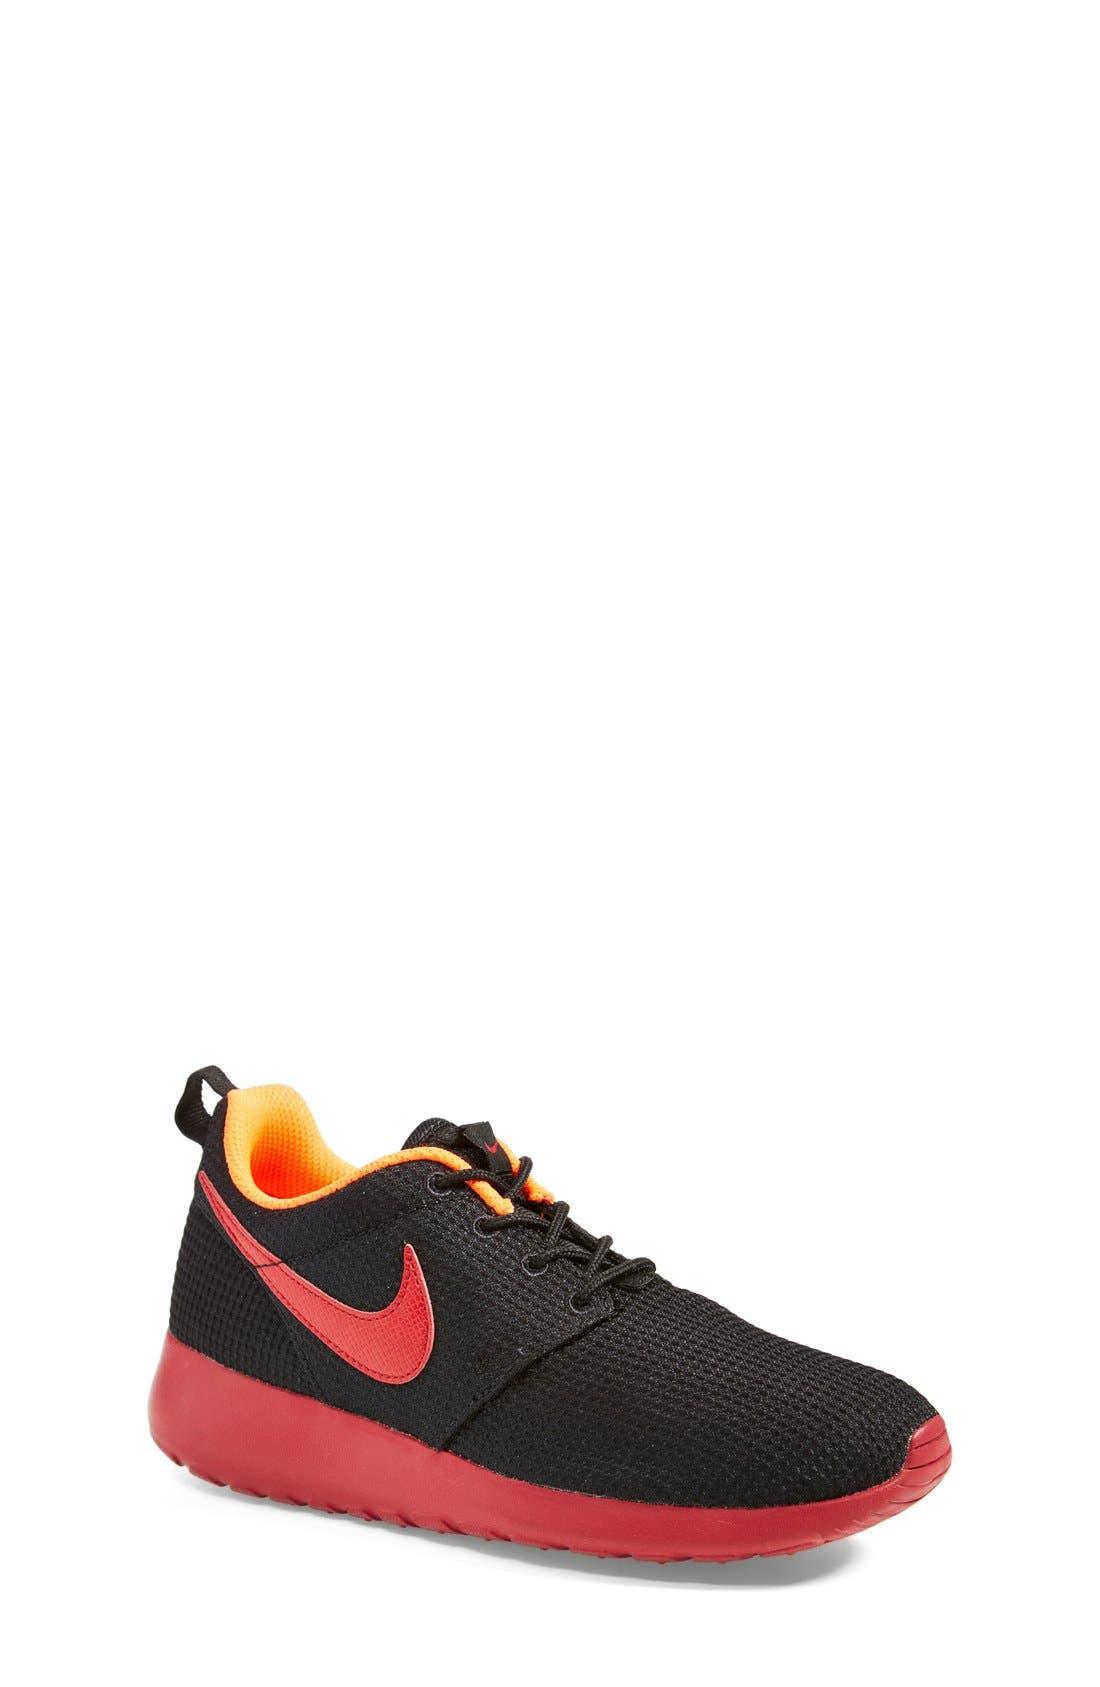 Alternate Image 1 Selected - Nike 'Roshe Run' Sneaker (Big Kid)